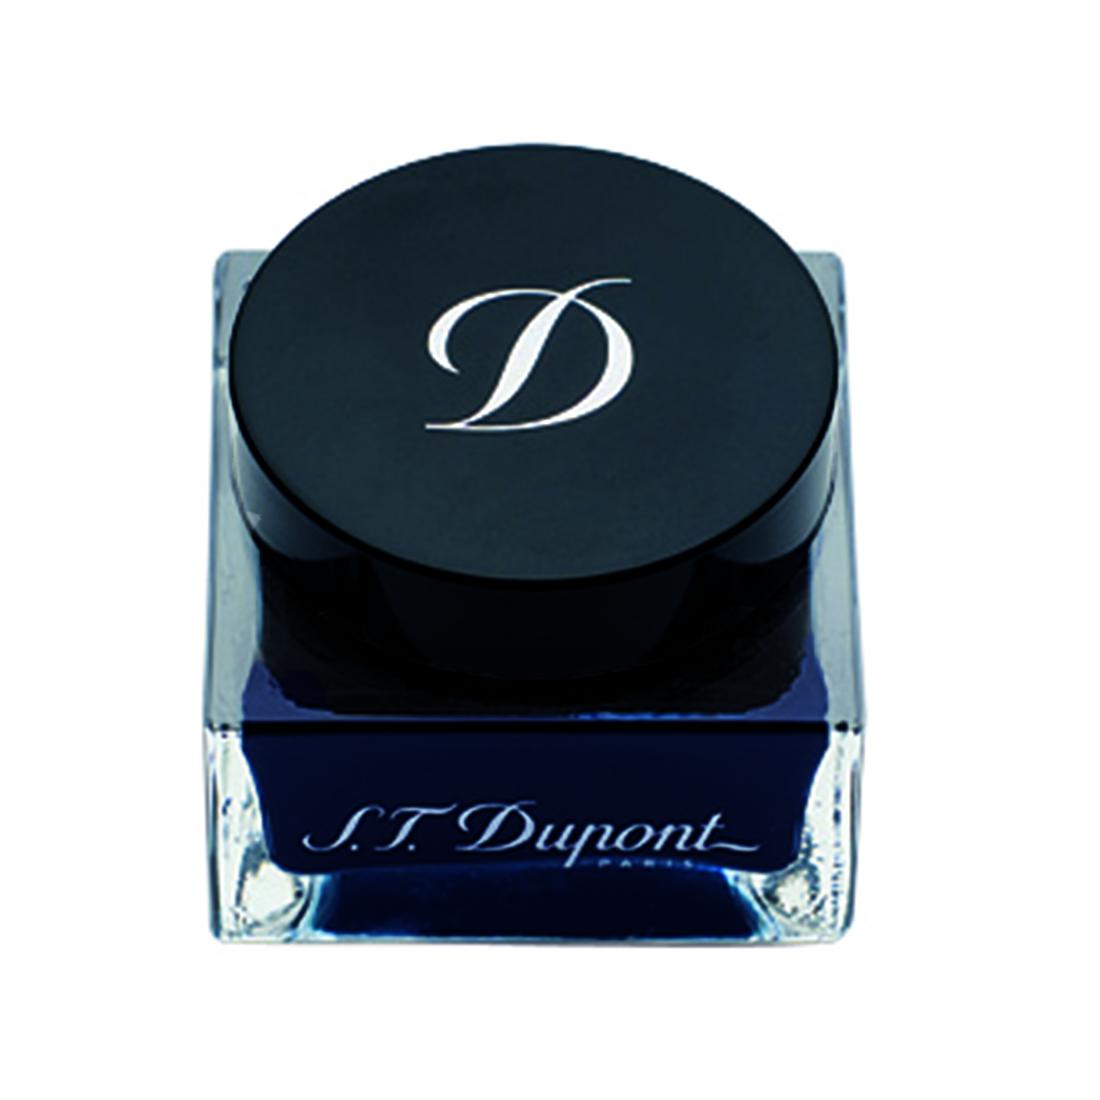 Photo de Flacon S.T. Dupont Encre Bleu Royal 50 ml